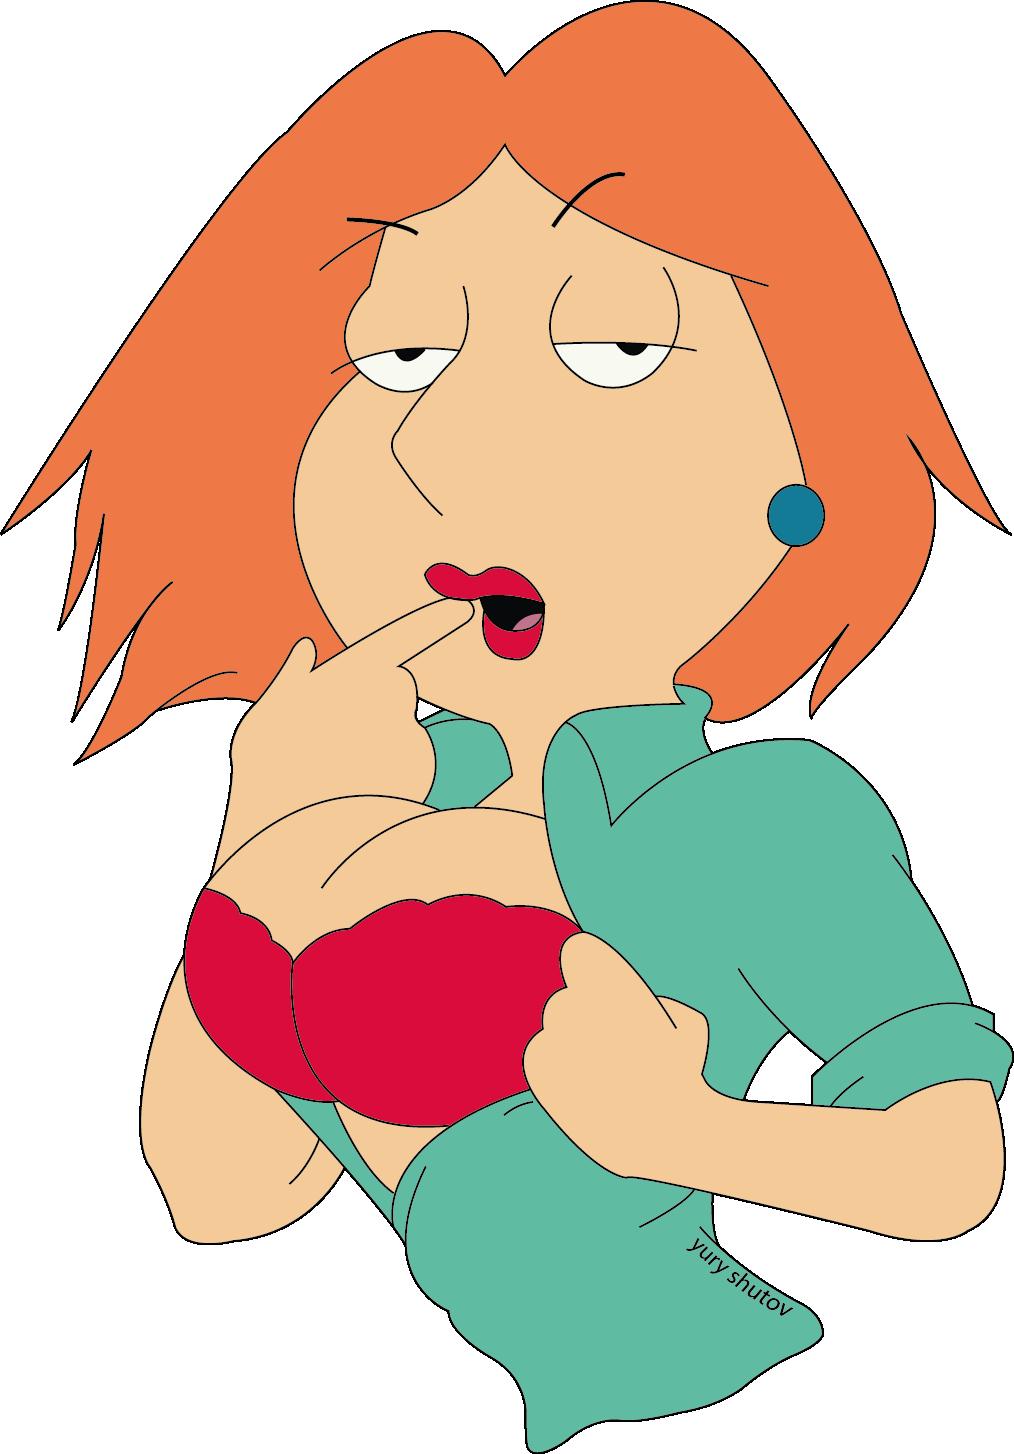 My, those cartoon bikini meg griffen perfect